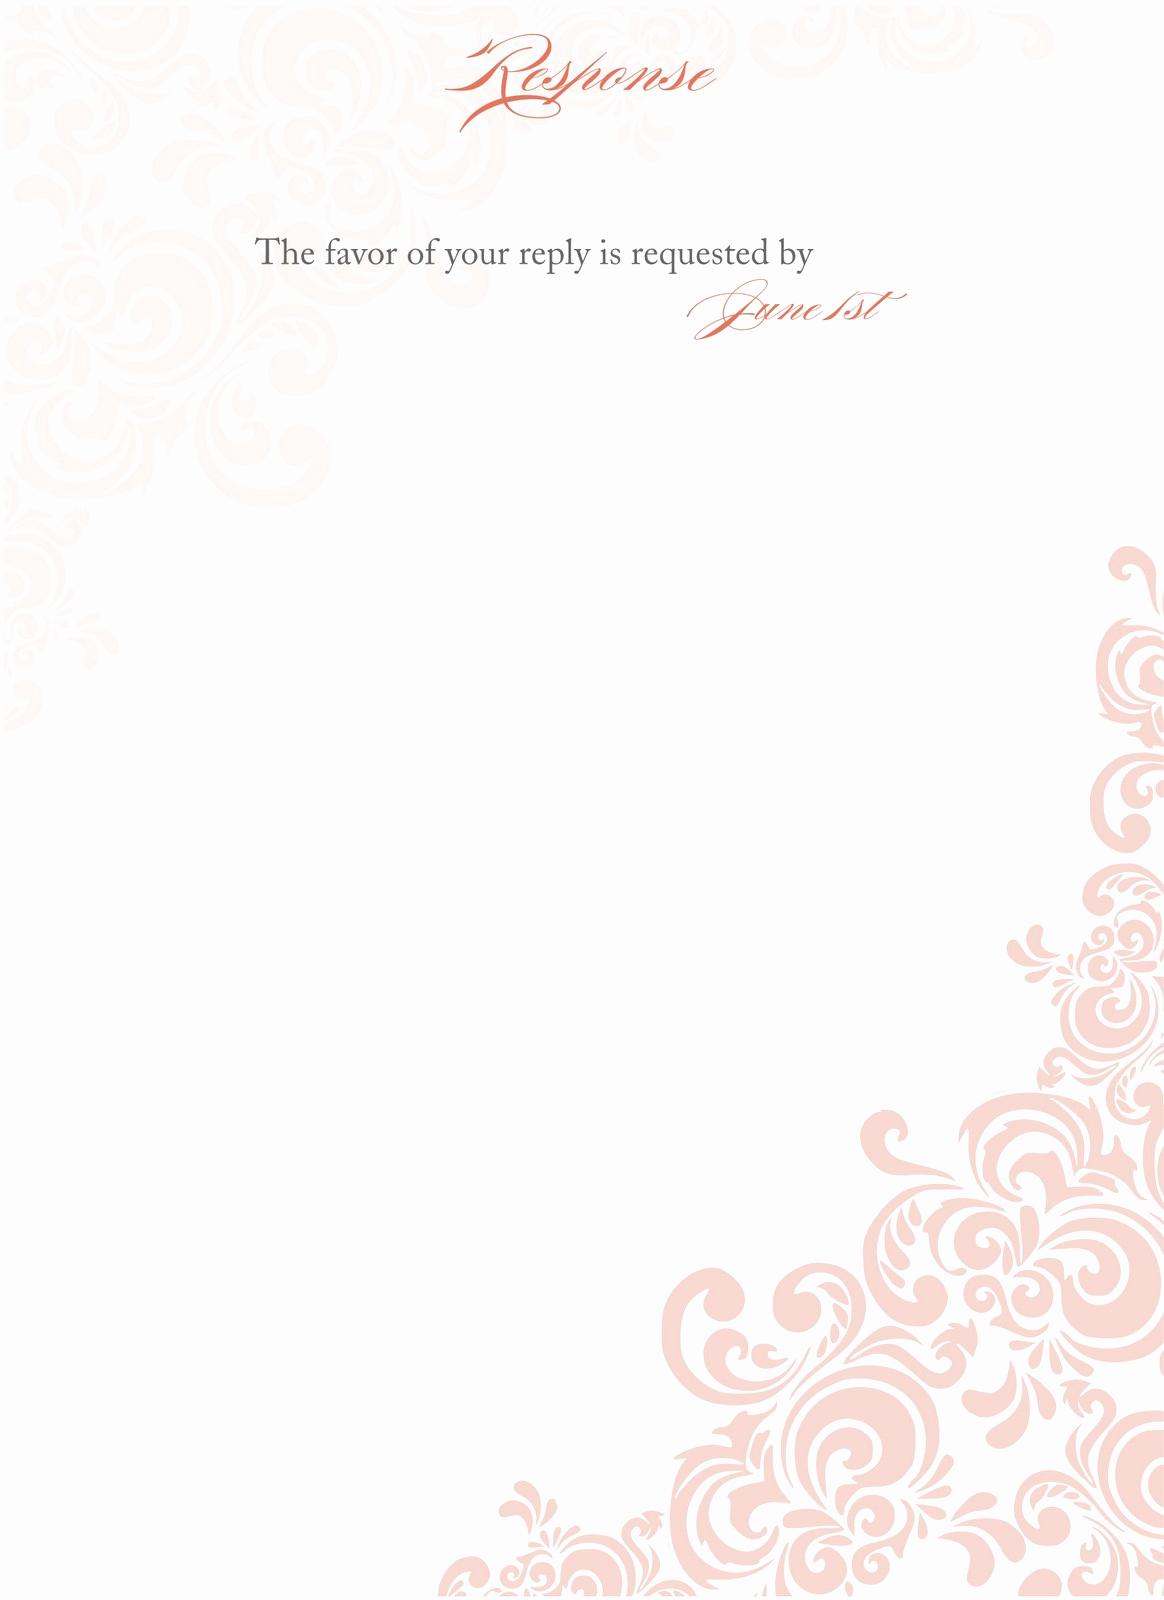 Blank Wedding Invitation Templates Awesome Blank Wedding Invitations Samples